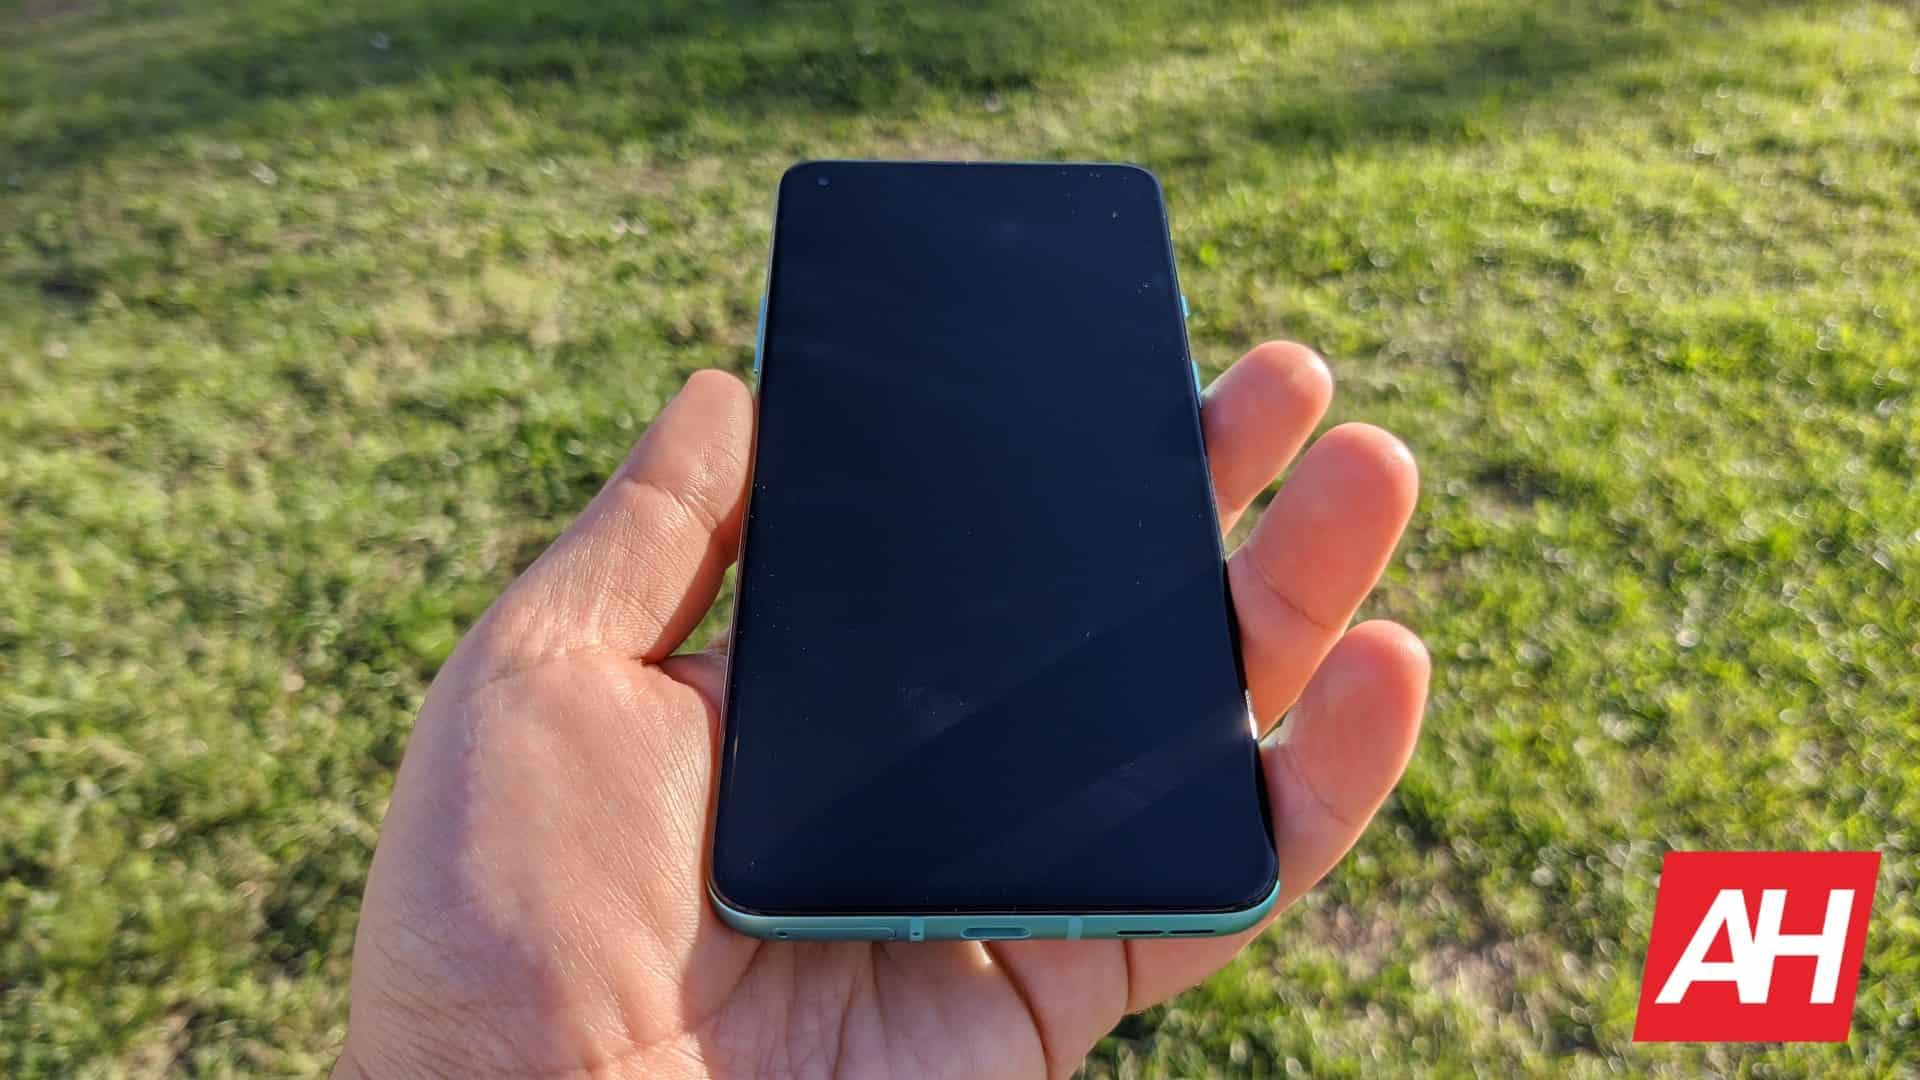 AH OnePlus 8T image 84